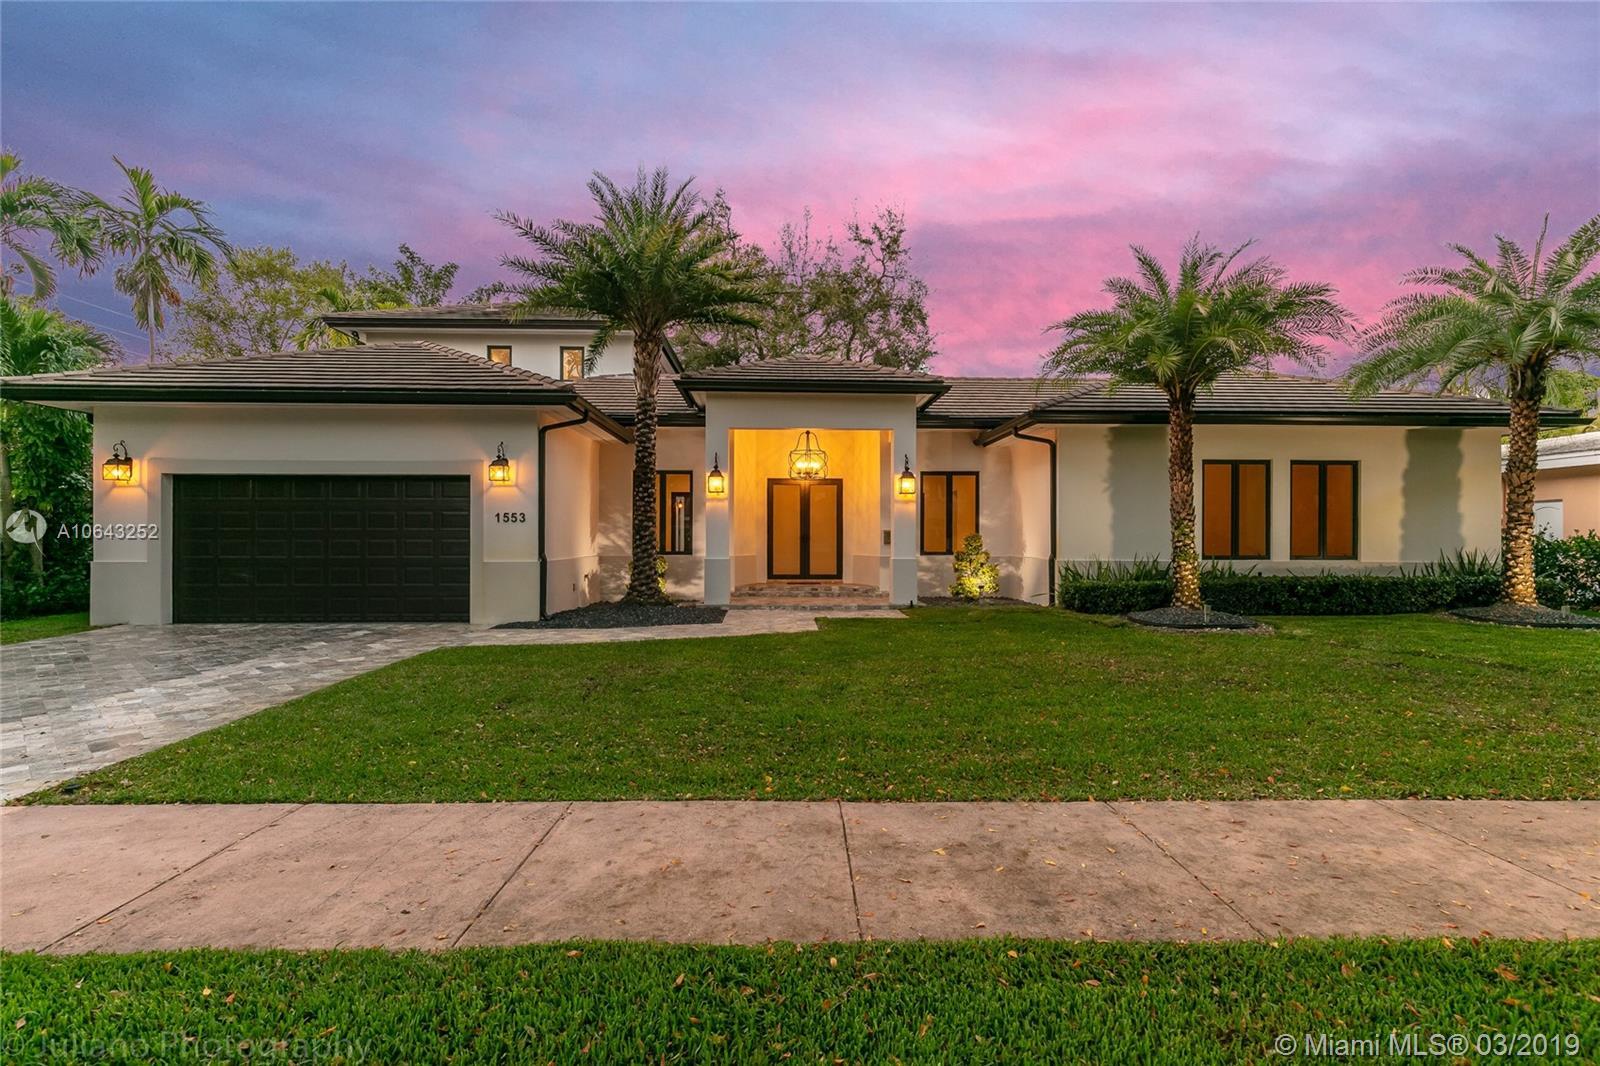 1553 Murcia Ave, Coral Gables FL 33134